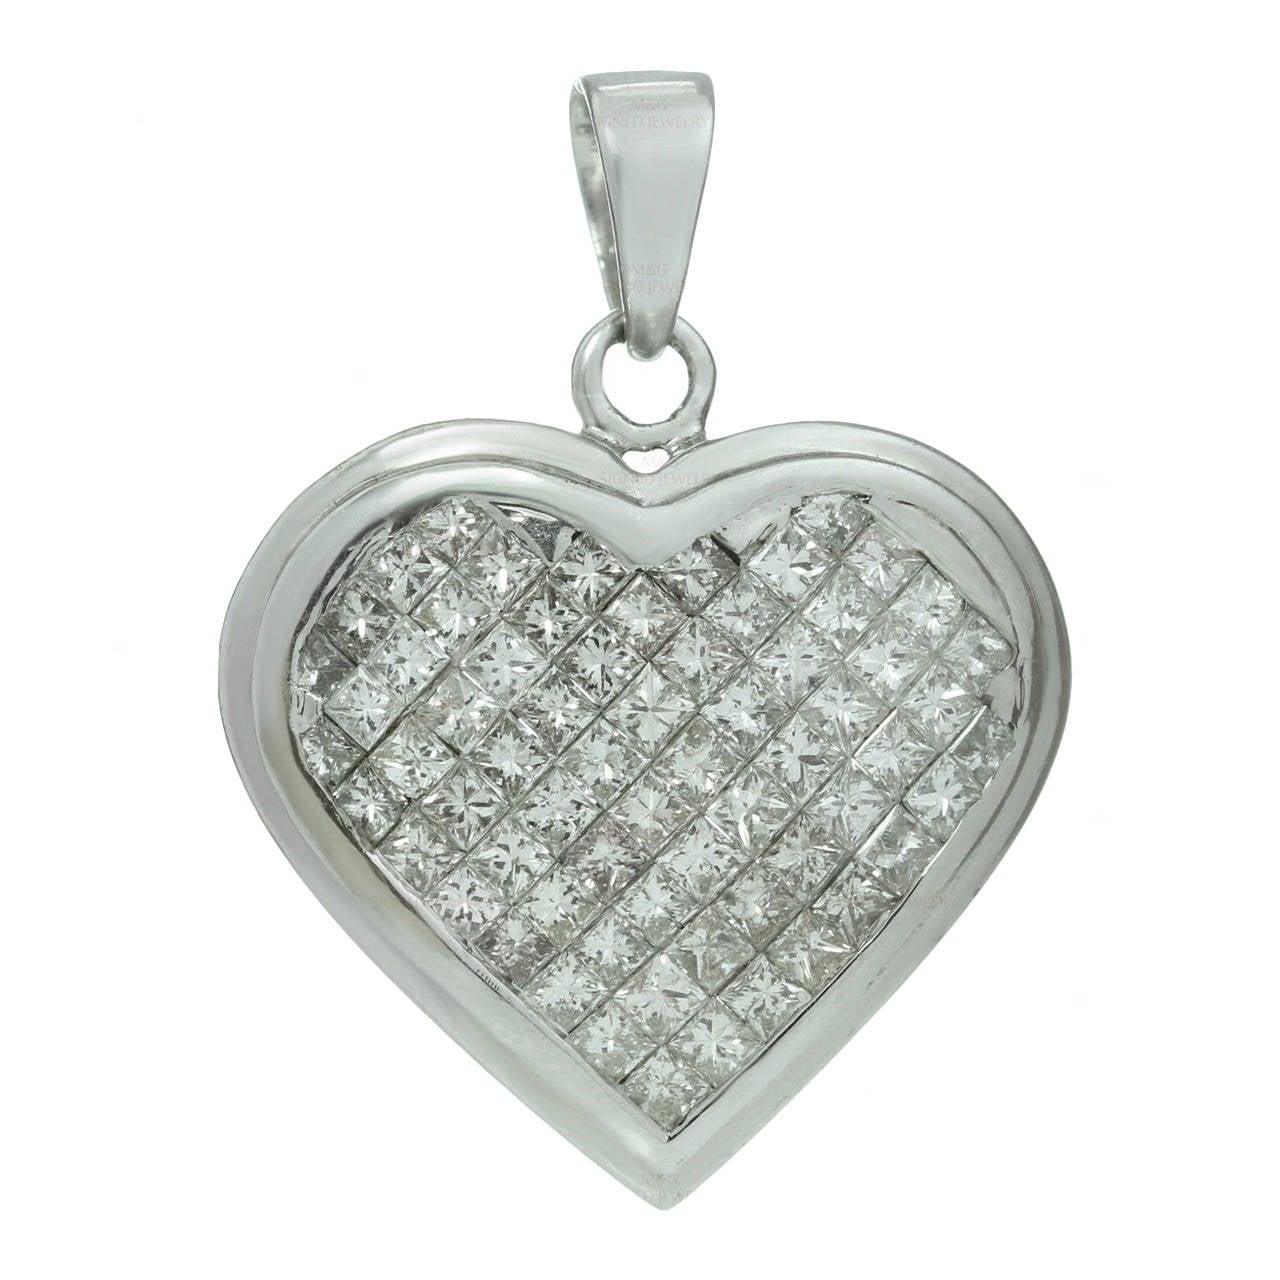 Diamond white gold heart shaped charm pendant for sale at 1stdibs diamond white gold heart shaped charm pendant for sale aloadofball Choice Image